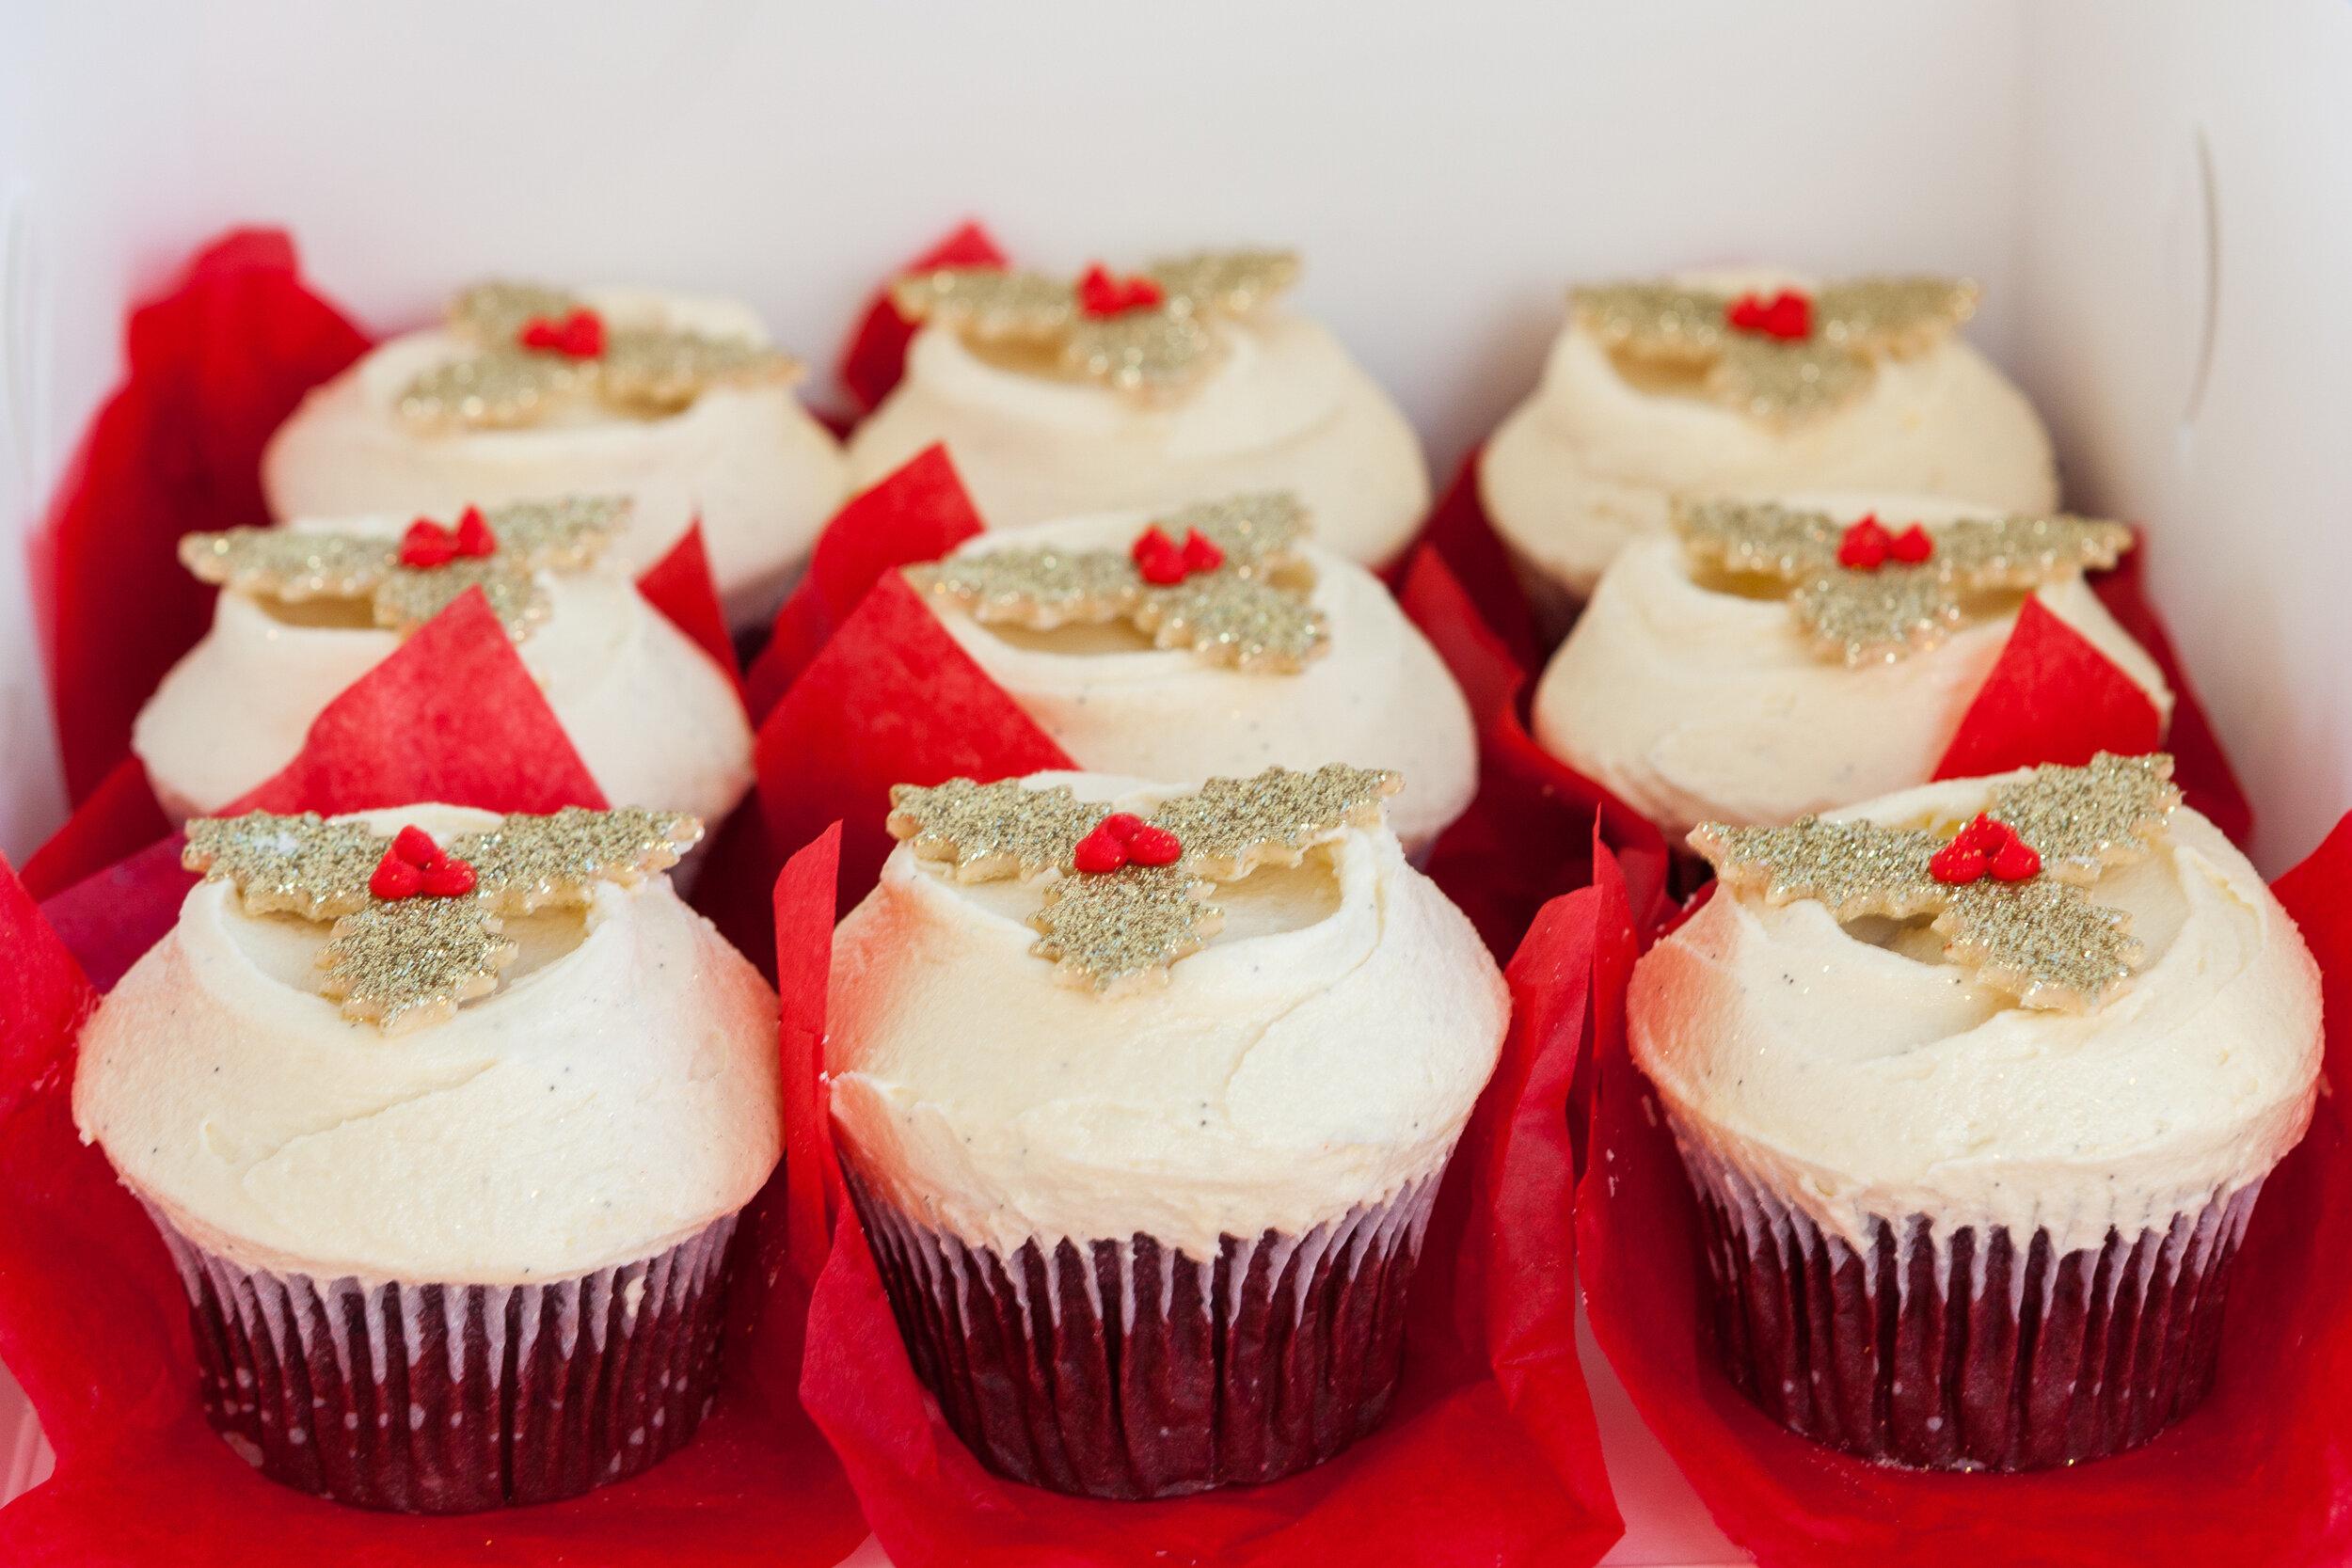 Vanillapodspecialtycakes_Christmas2019-73.jpg